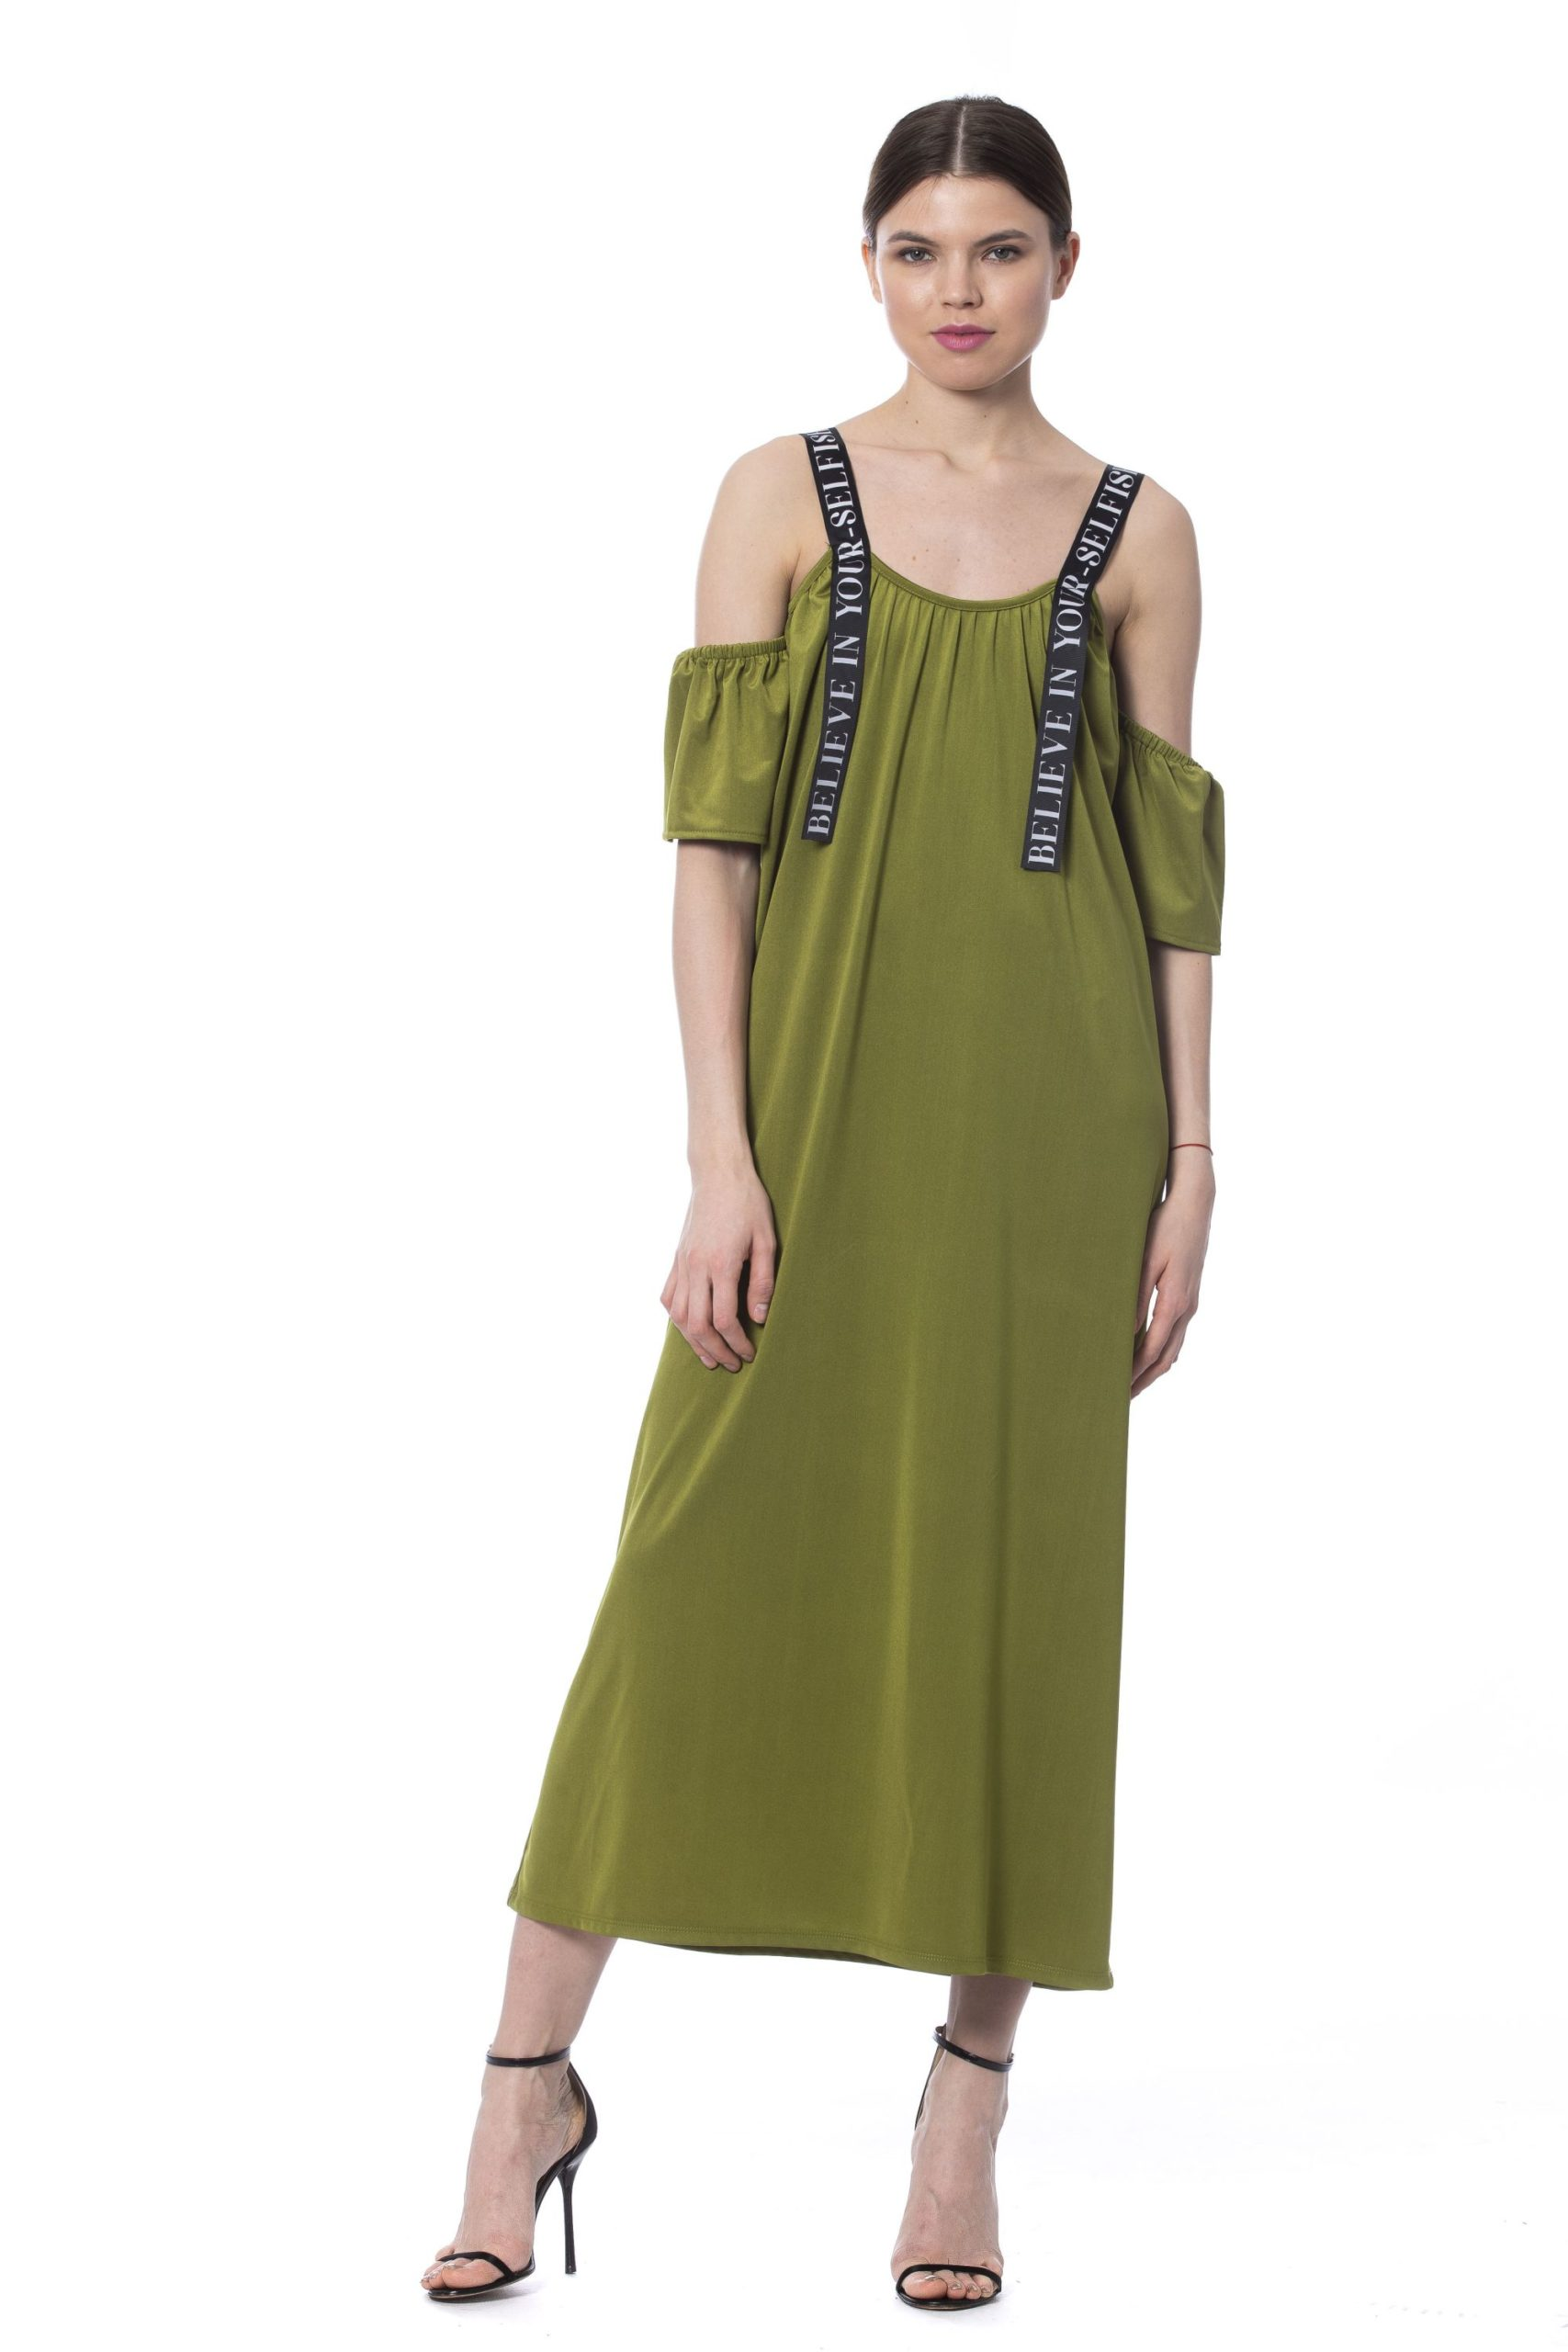 Silvian Heach Women's LS Dress Army SI1020293 - XS